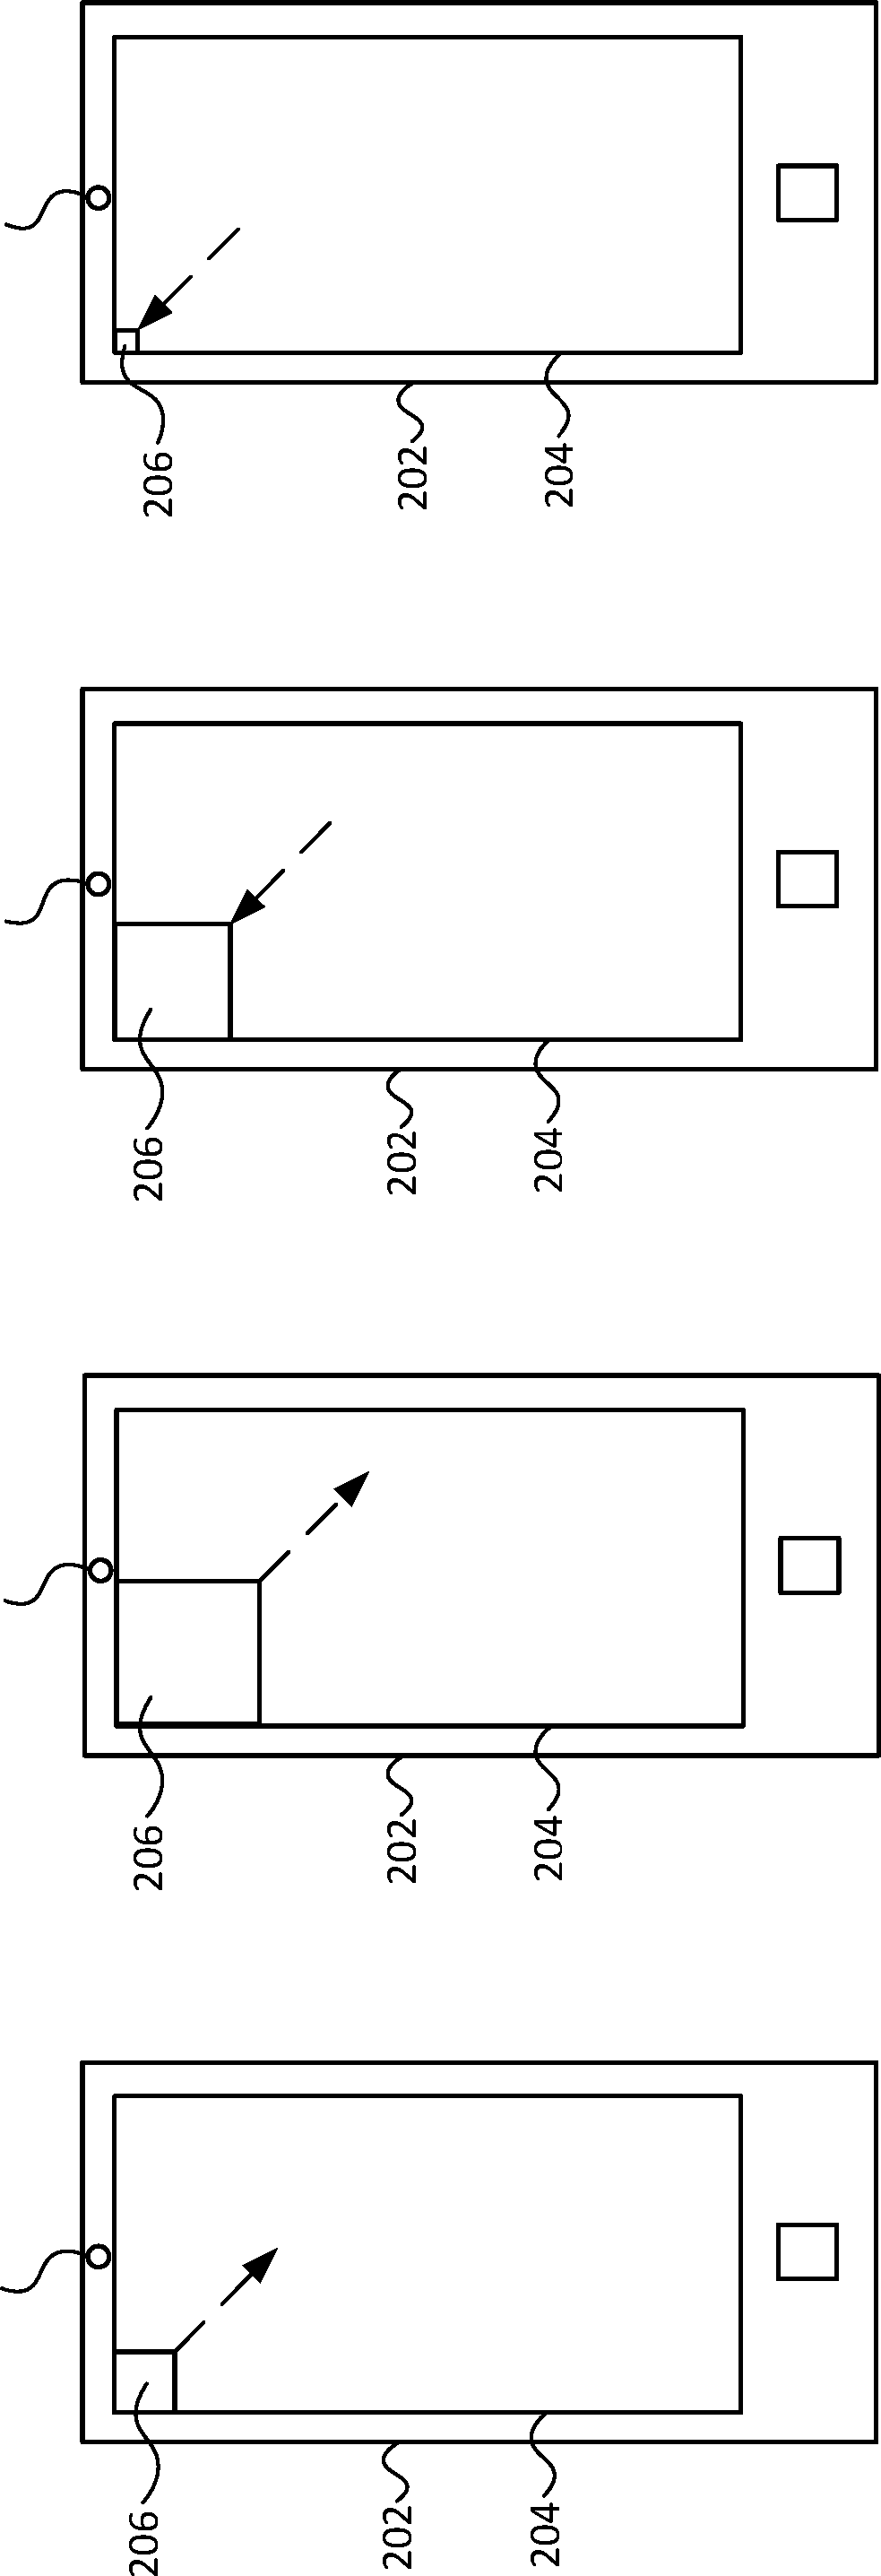 Figure GB2560340A_D0011